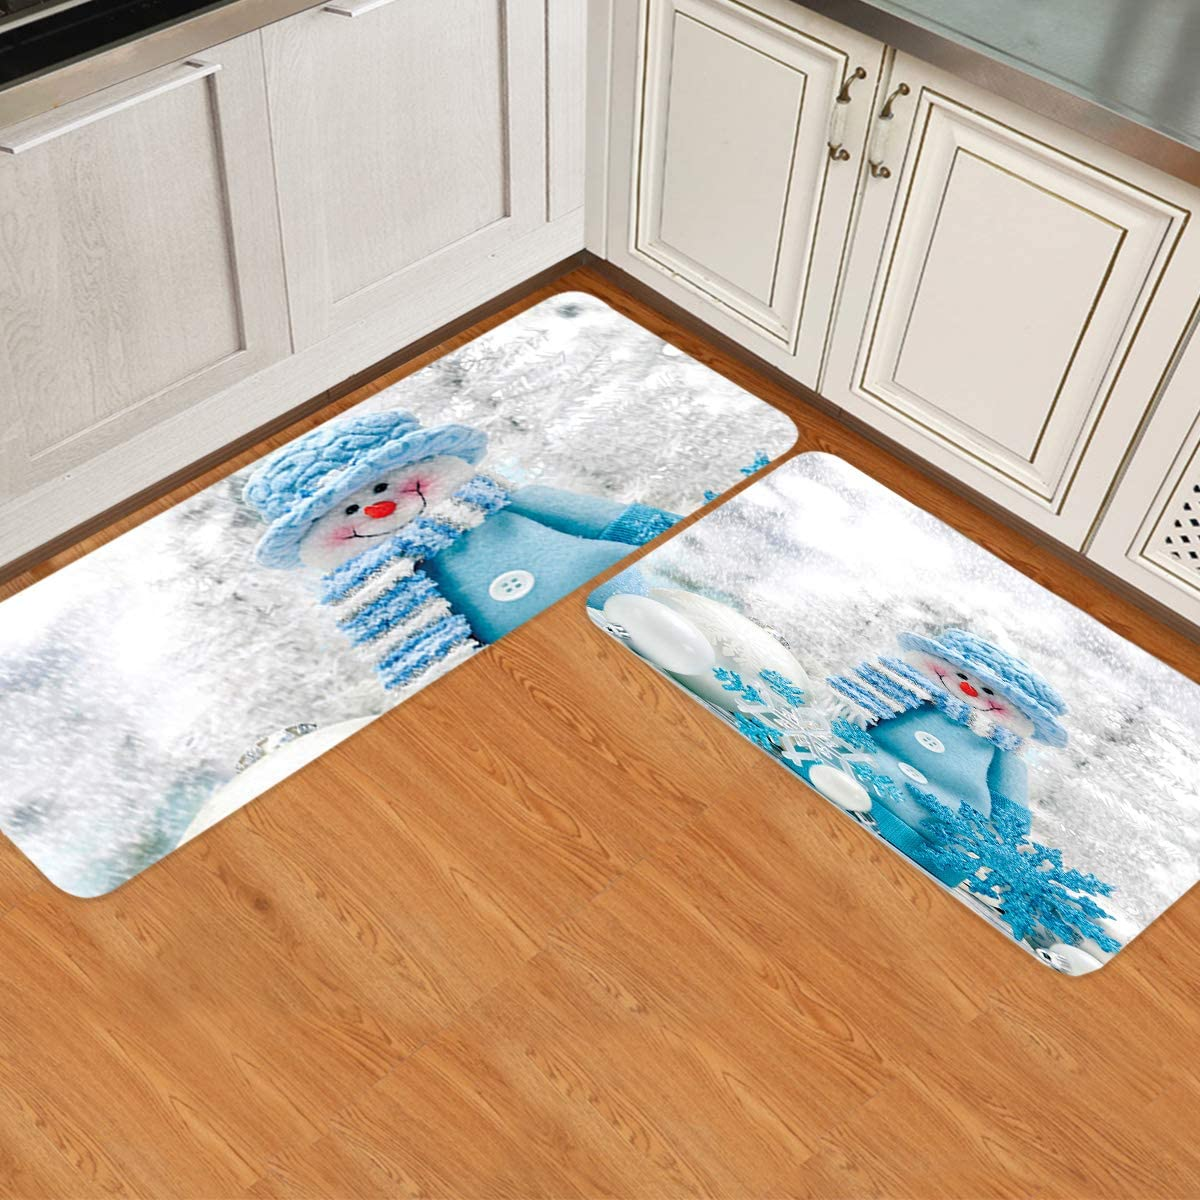 Prime Leader 2 Piece Non-Slip Kitchen Mat Doormat Runner Set Rug Max Translated 68% OFF